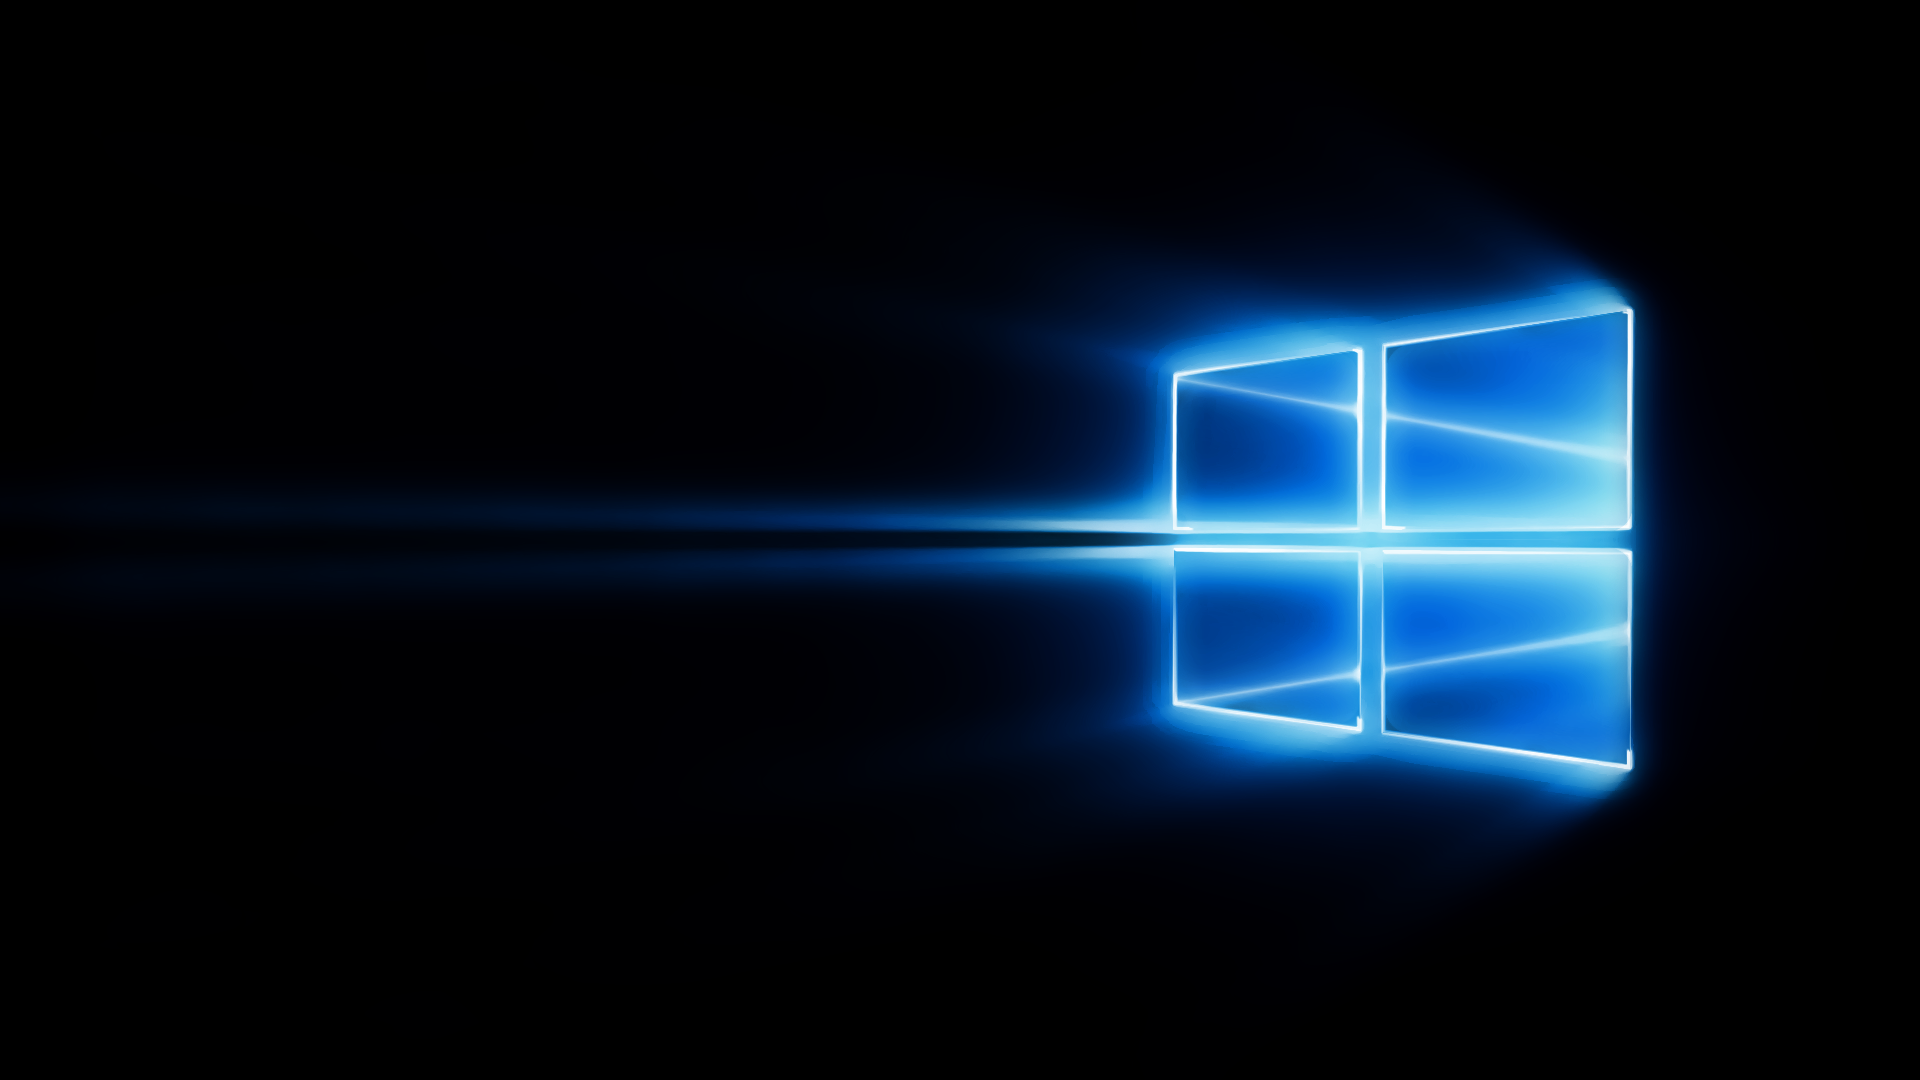 HD Windows 10 Wallpaper HD Wallpapers Pulse 1920x1080